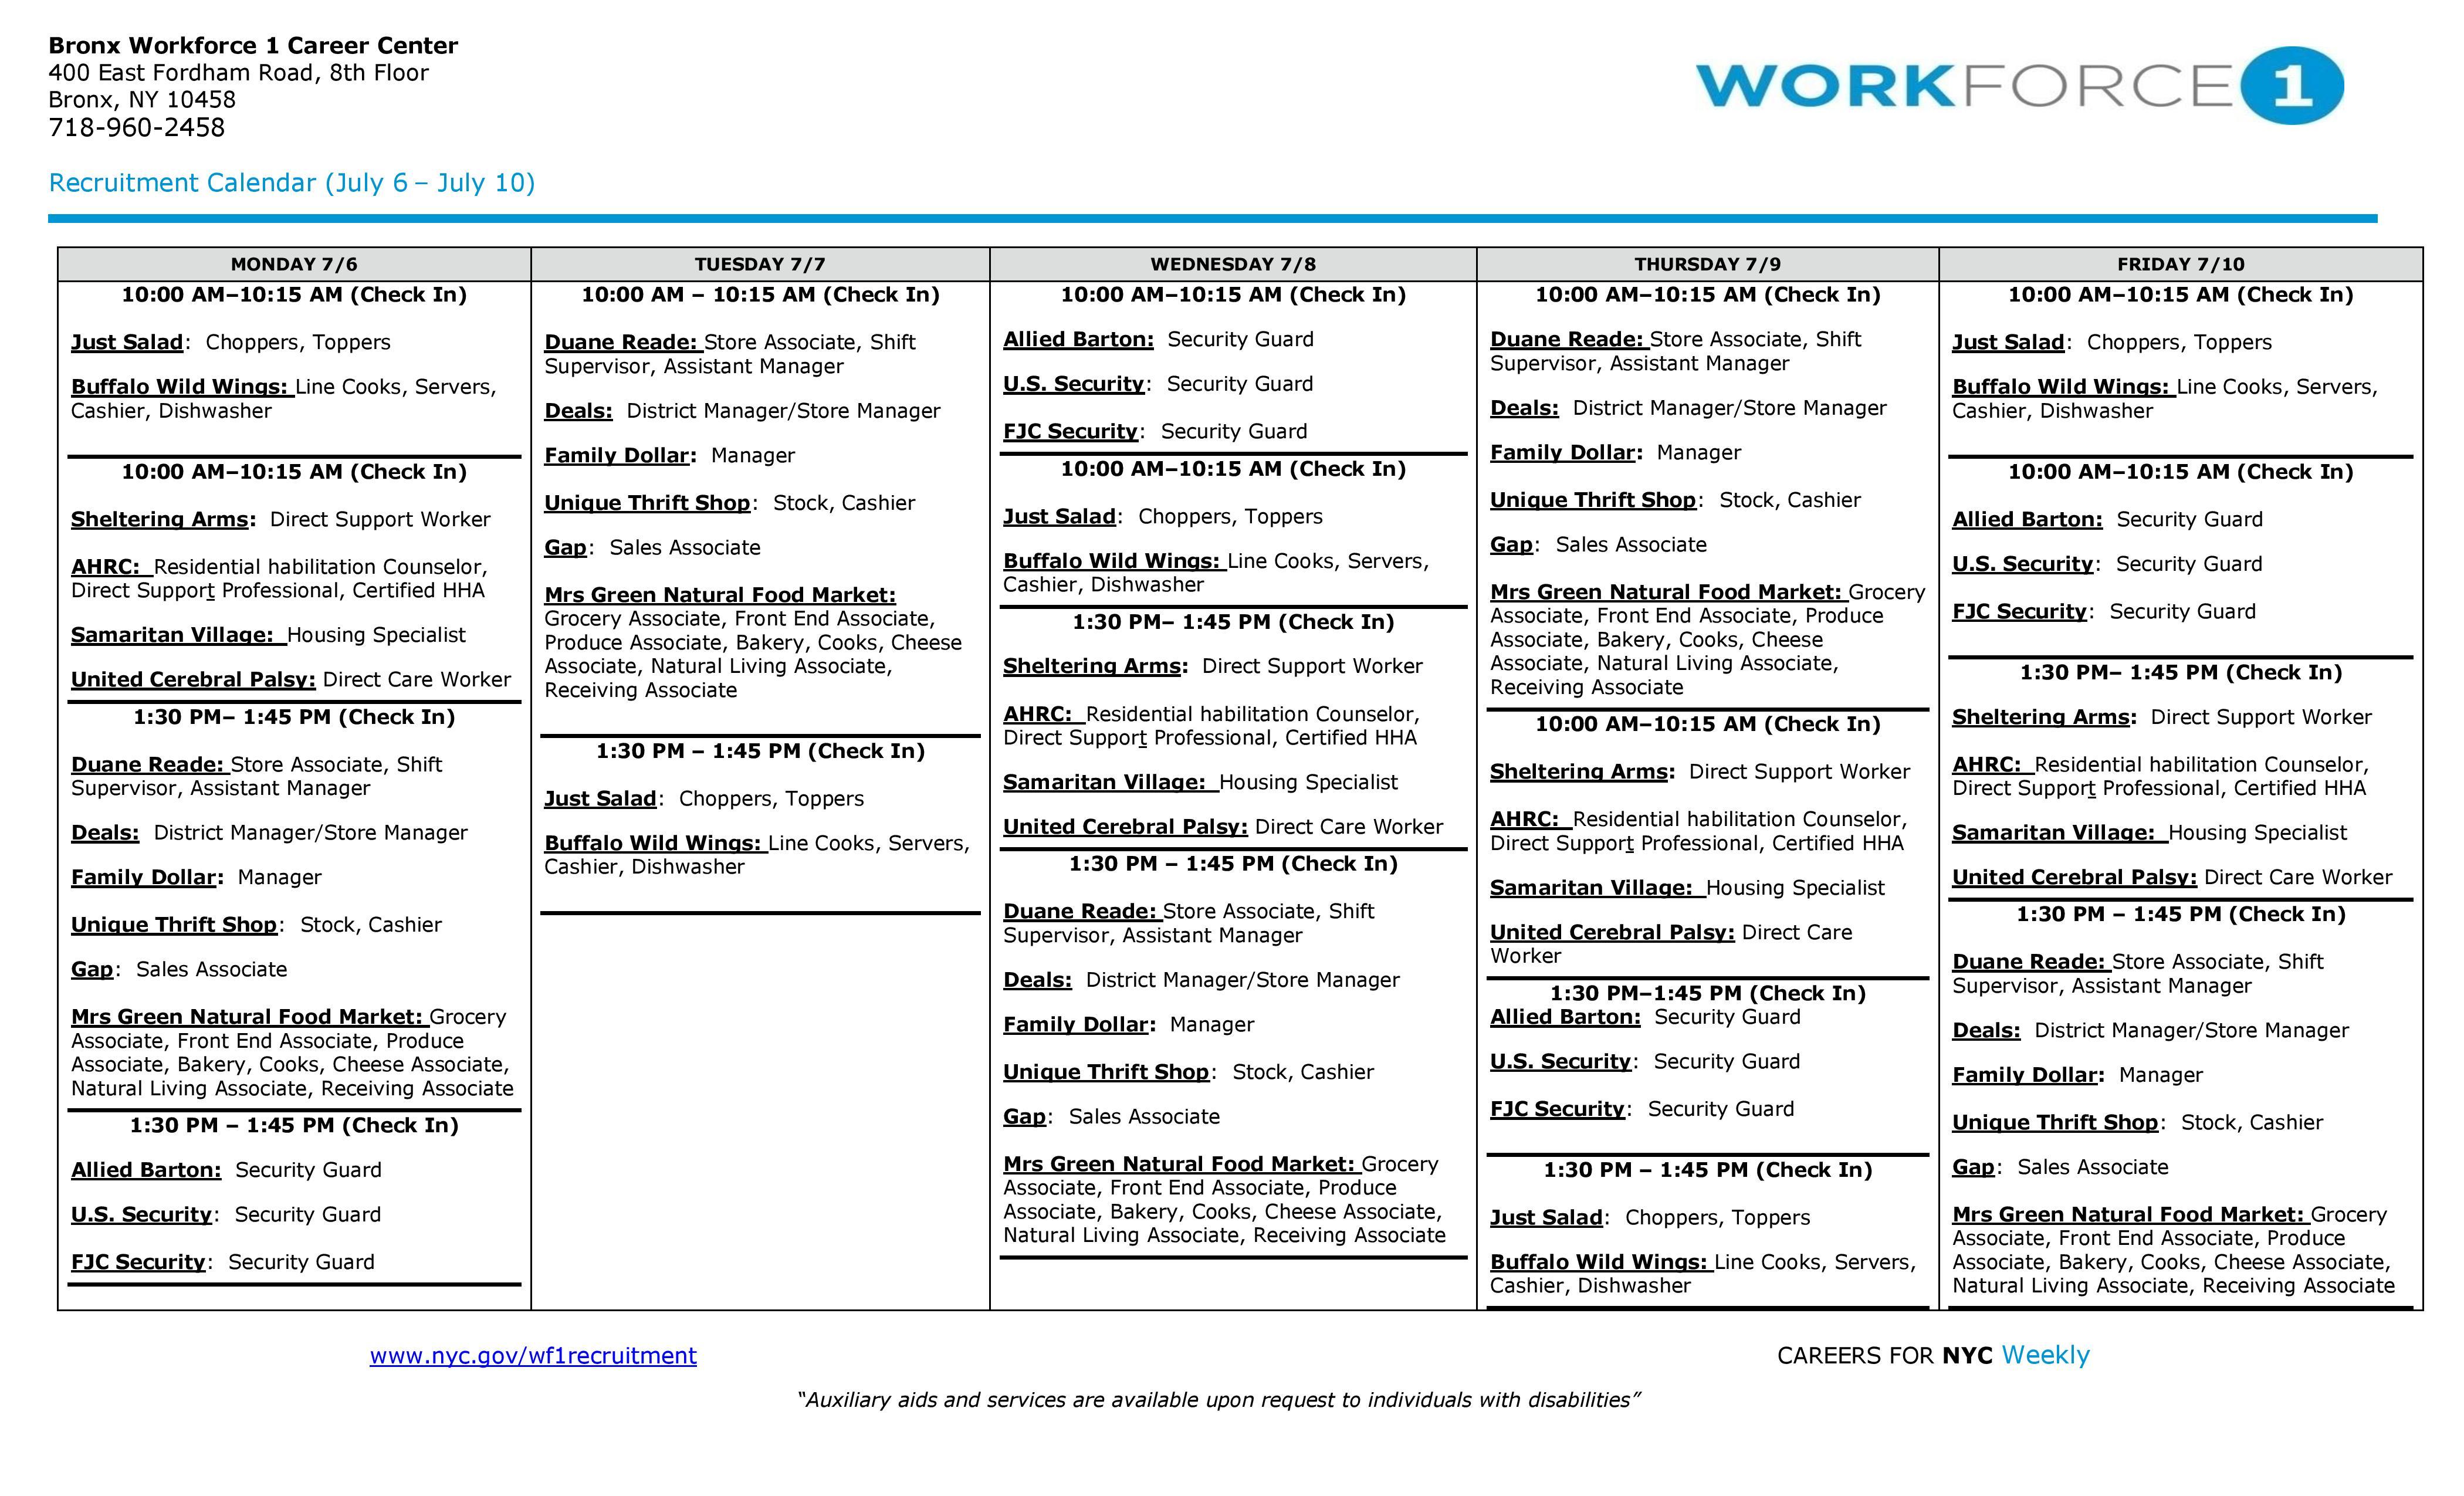 careerdevelopment new york city council member fernando cabrera bronx workforce 1 job recruitment calendar